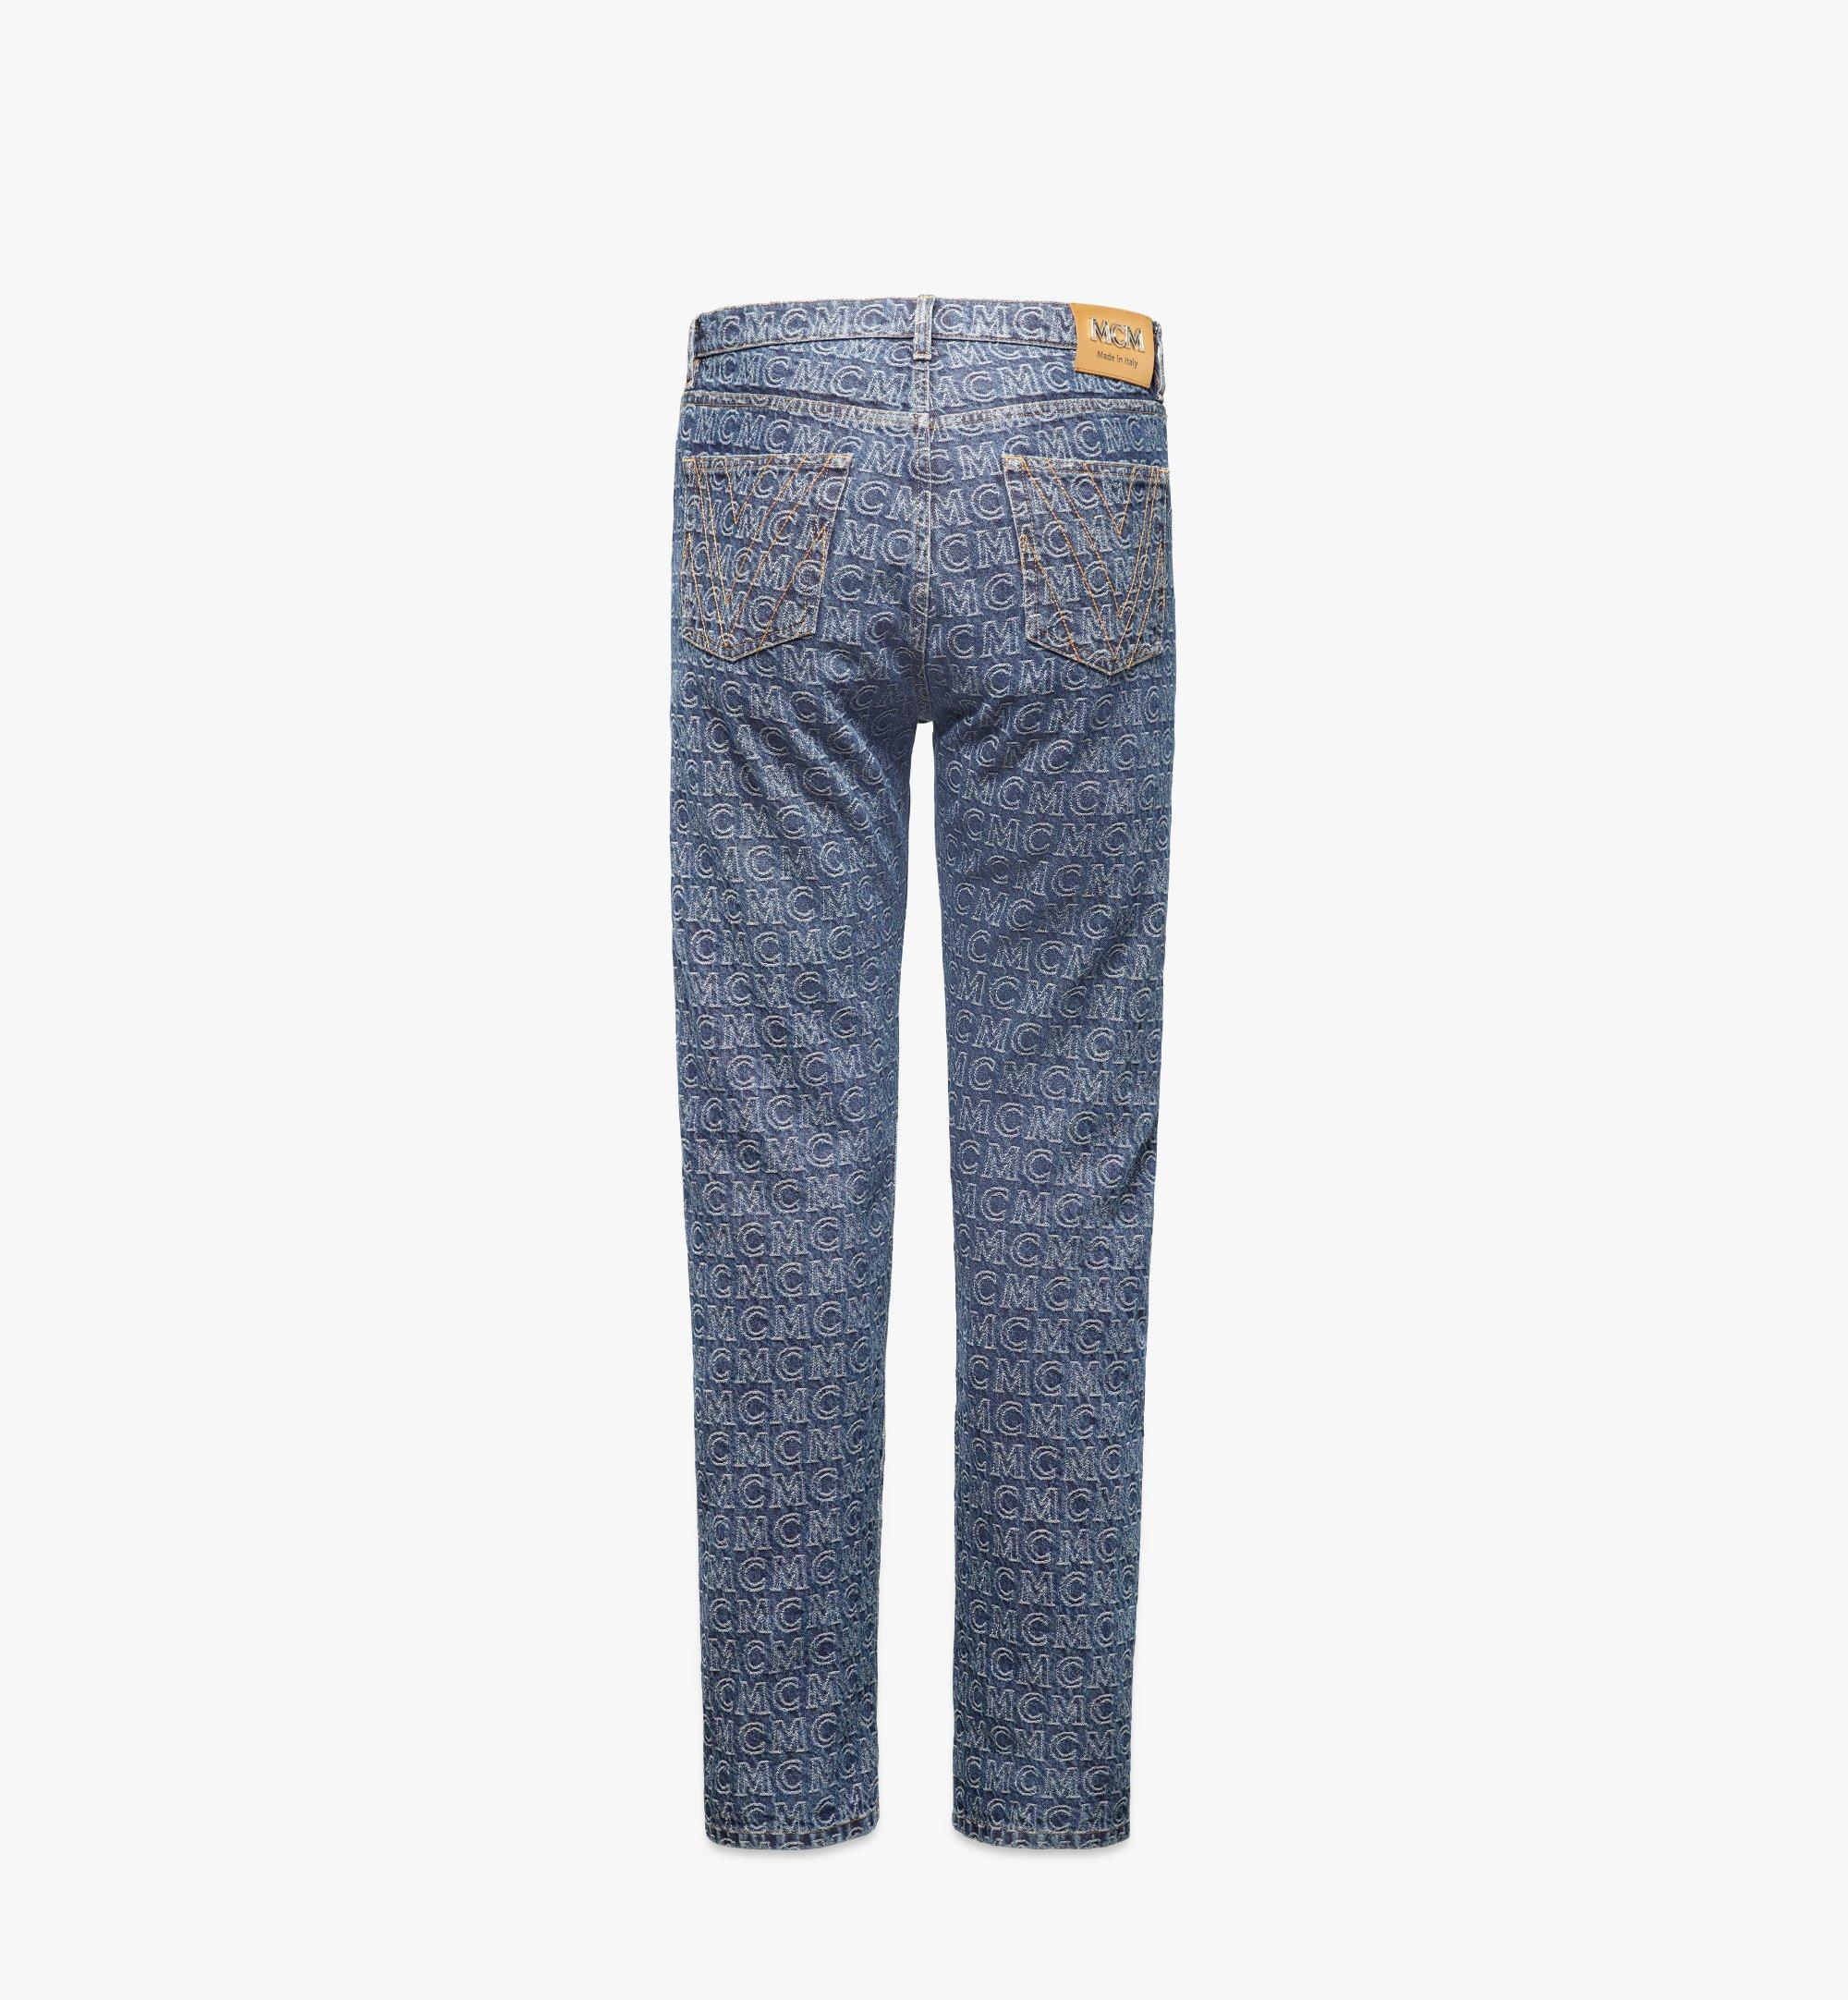 MCM Men's Monogram Straight Leg Jeans Blue MHPAADS01VW046 Alternate View 1